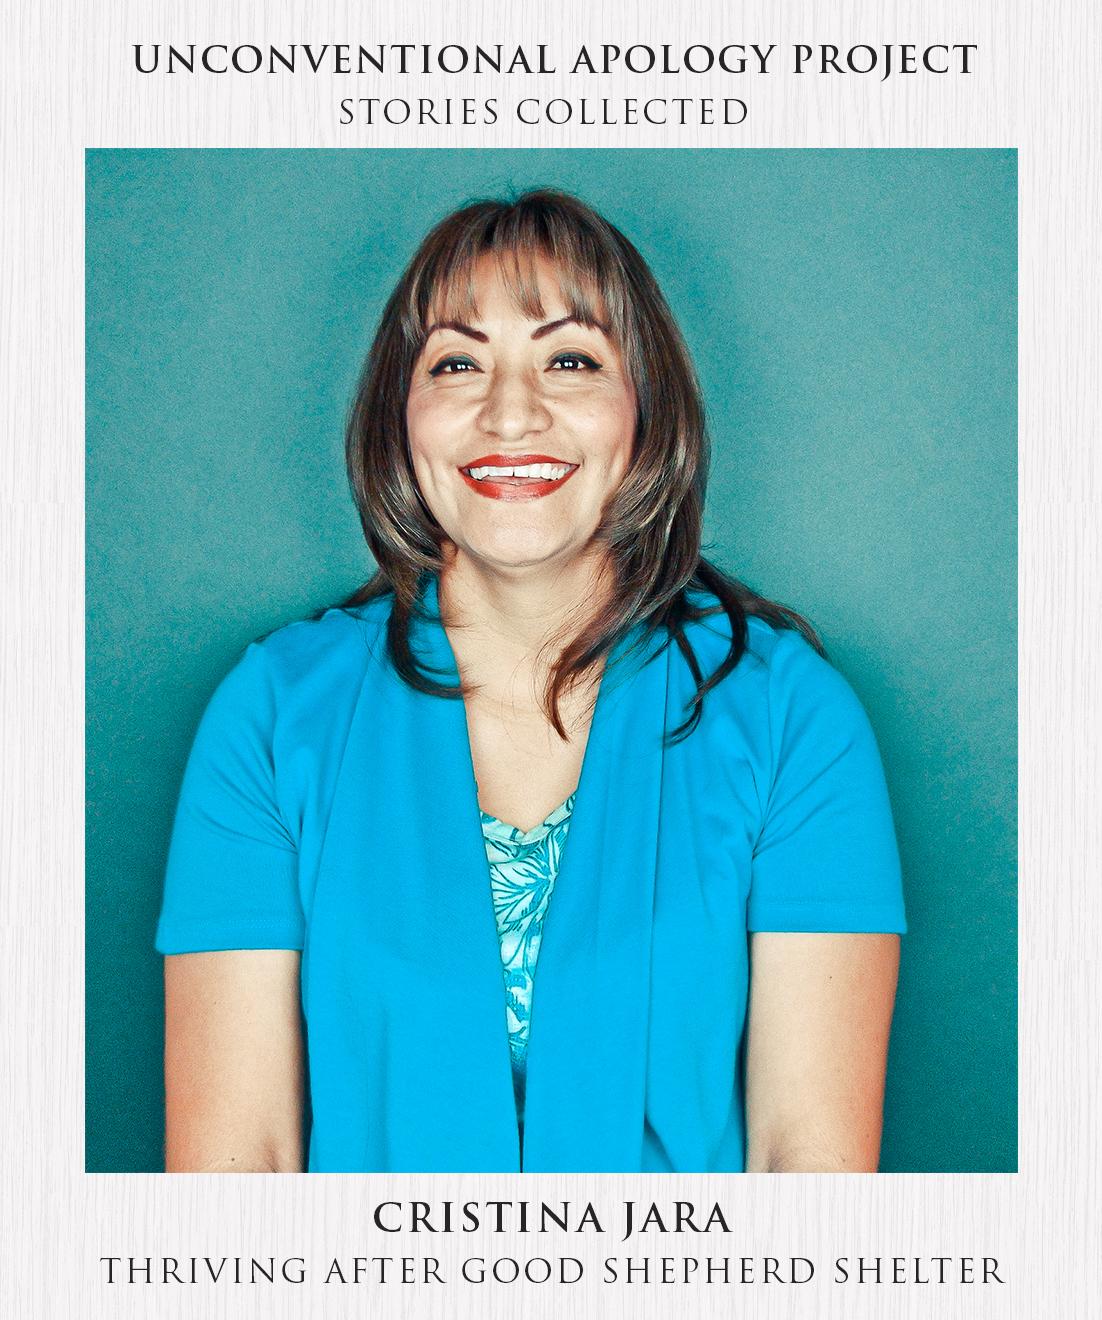 Cristina Jara in Stories Collected